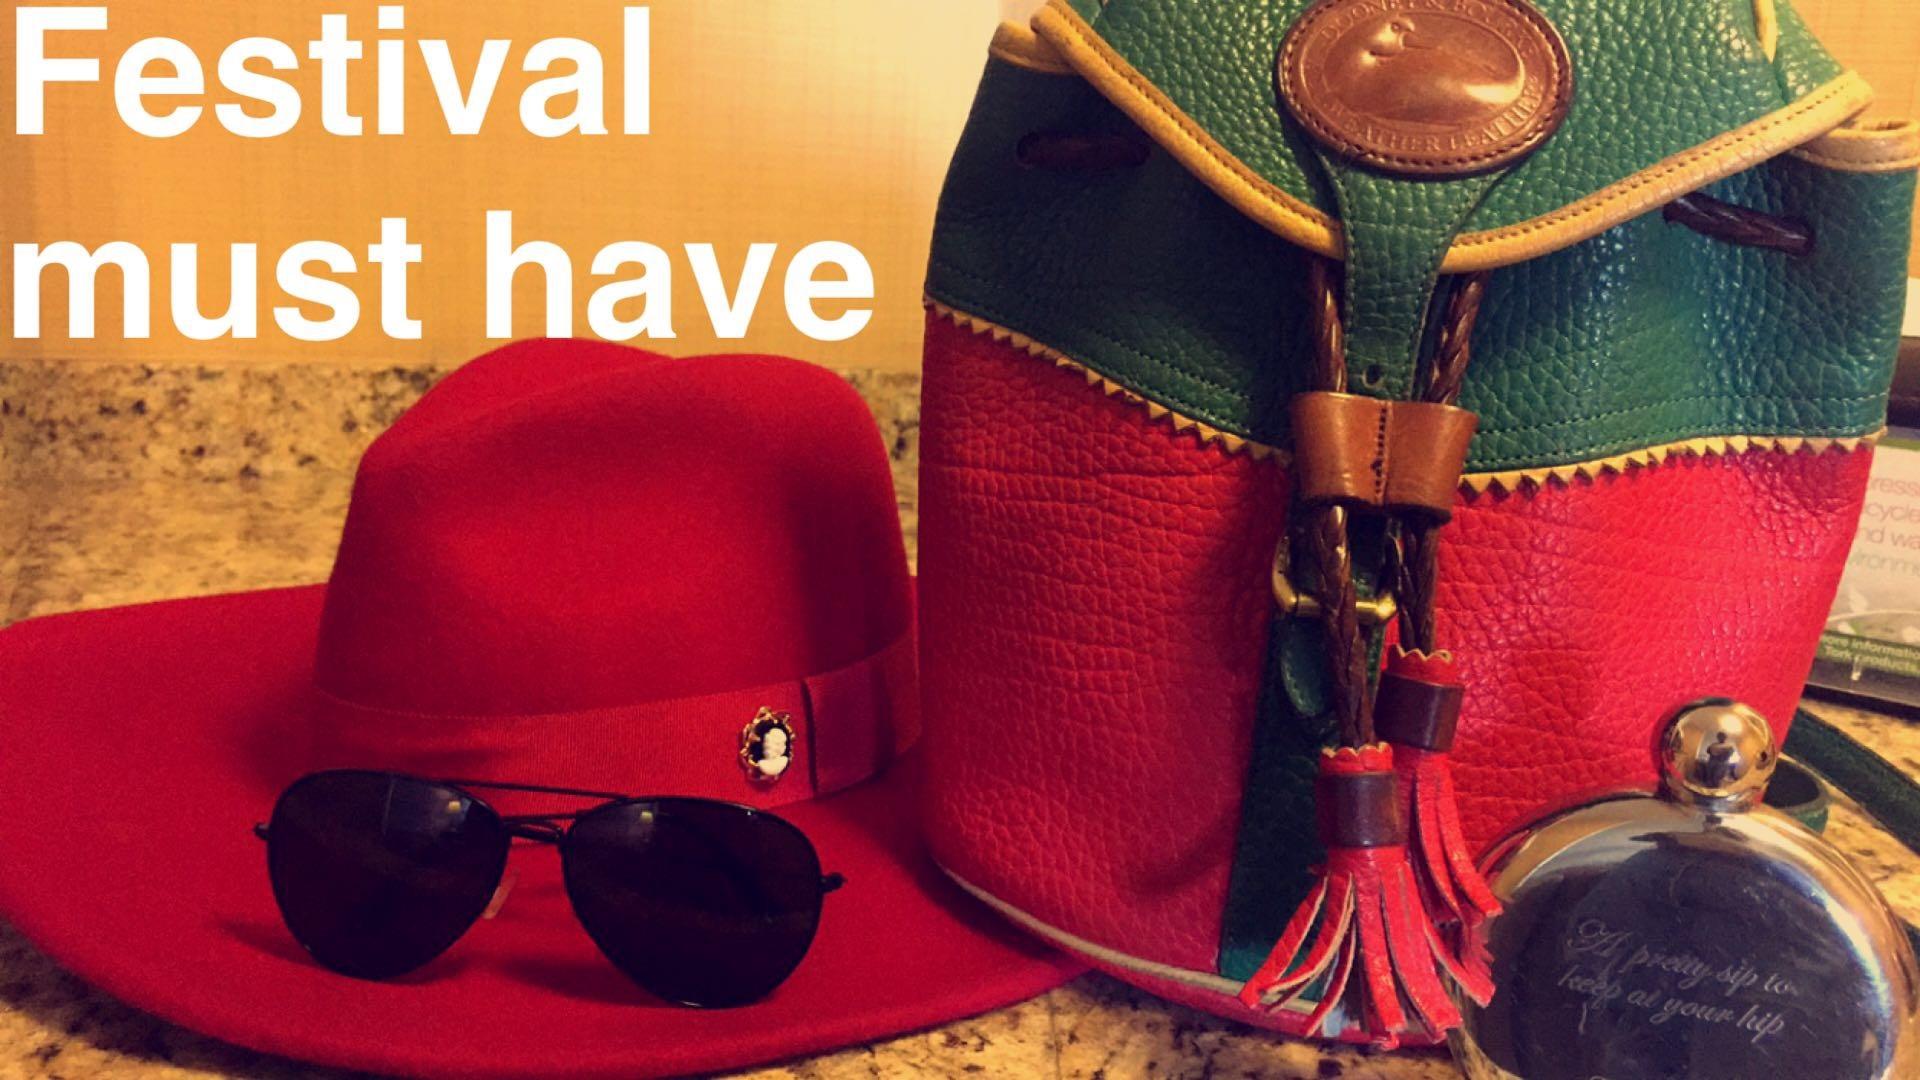 My Festical Essentials